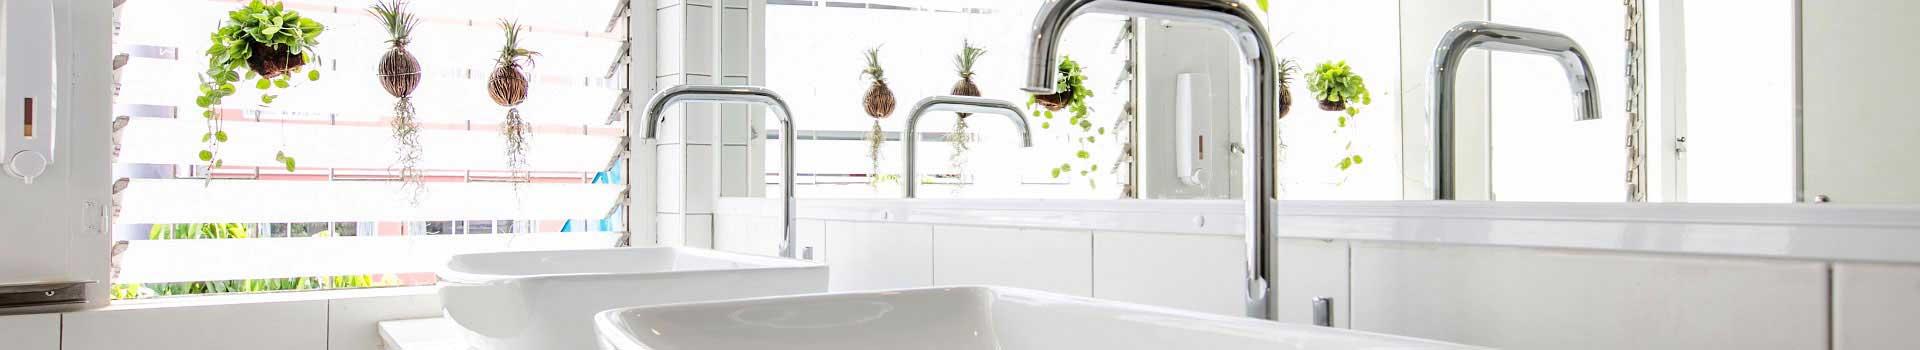 Washroom Hygiene Services